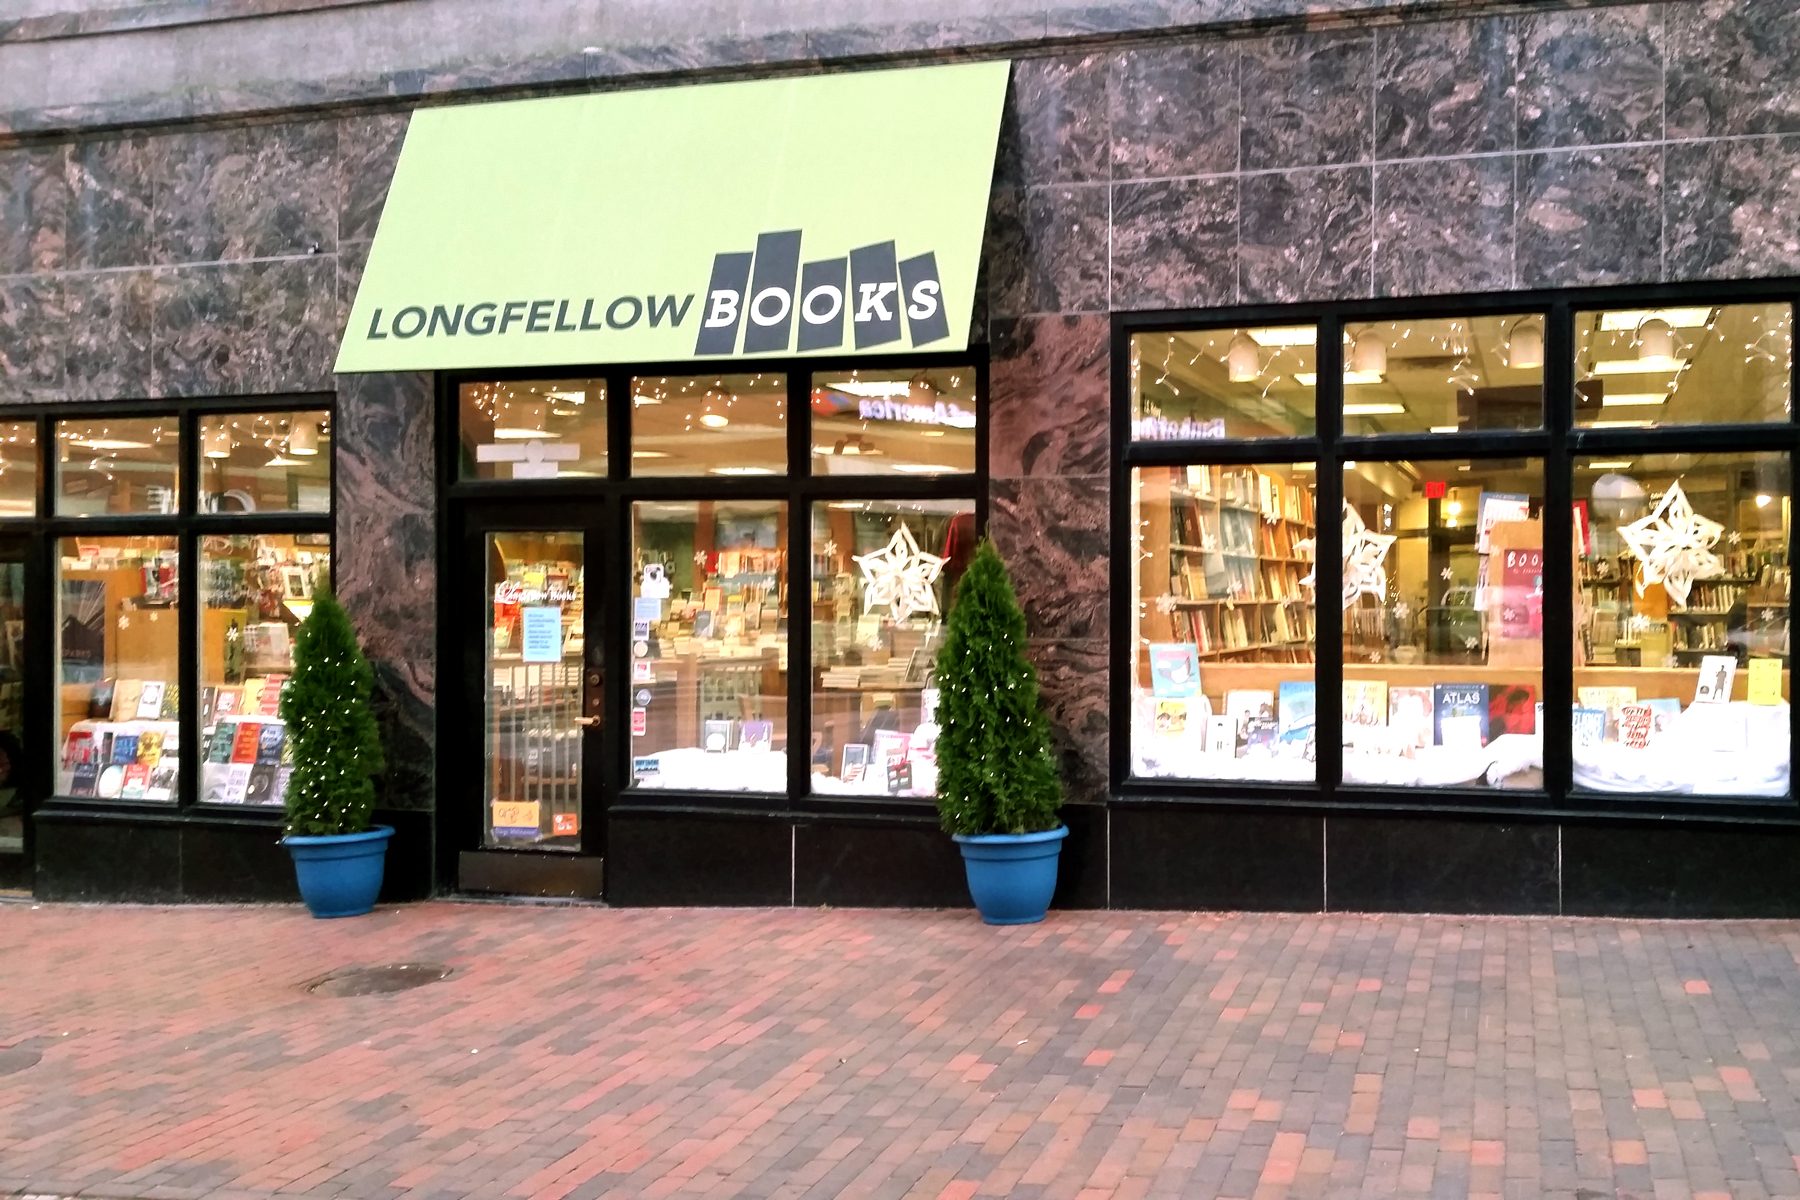 Longfello Books in Maine